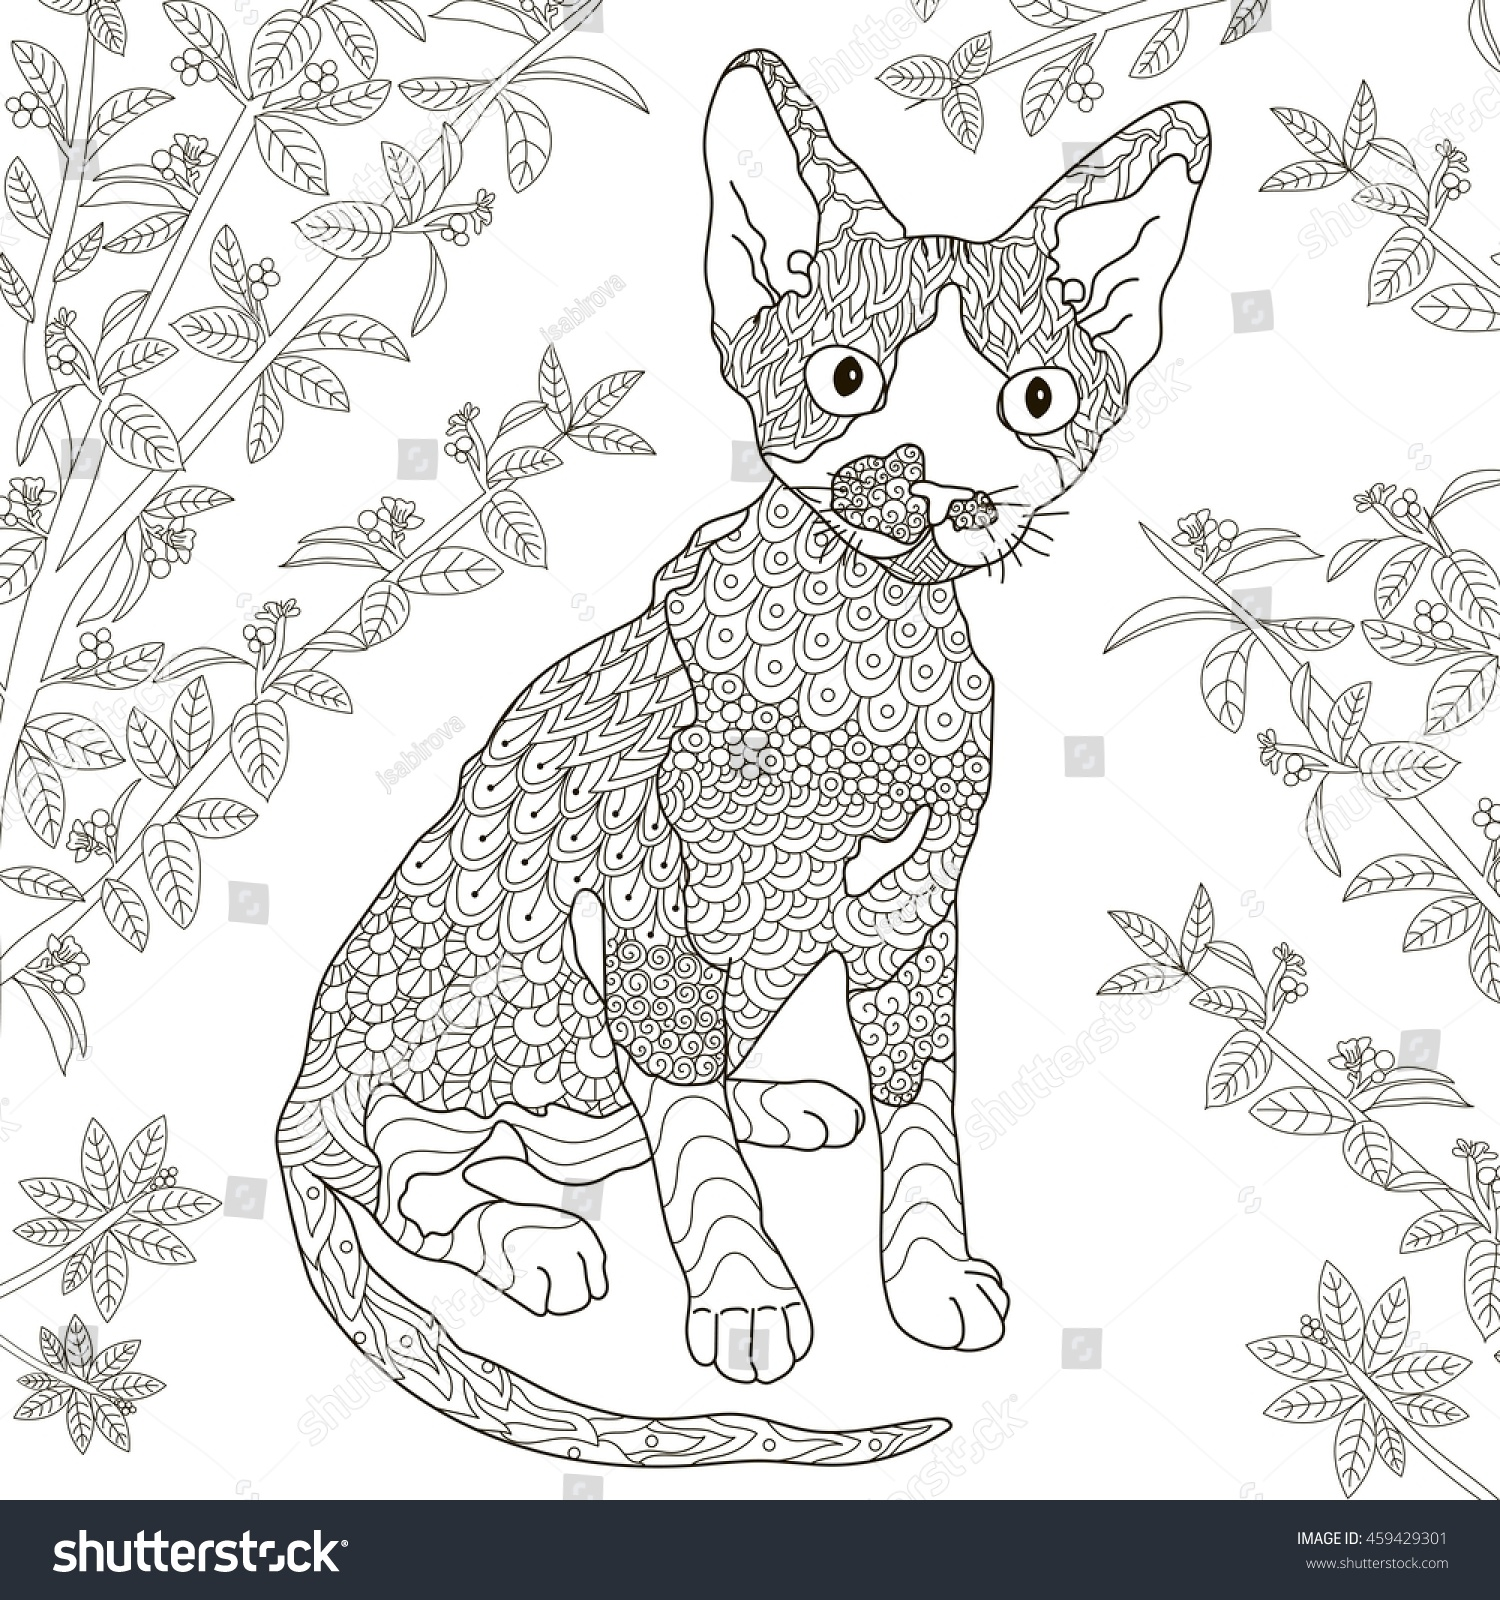 Zen cat coloring page - Zentangle Stylized Devon Rex Cat For Coloring Page Anti Stress Monochrome Pattern Vector